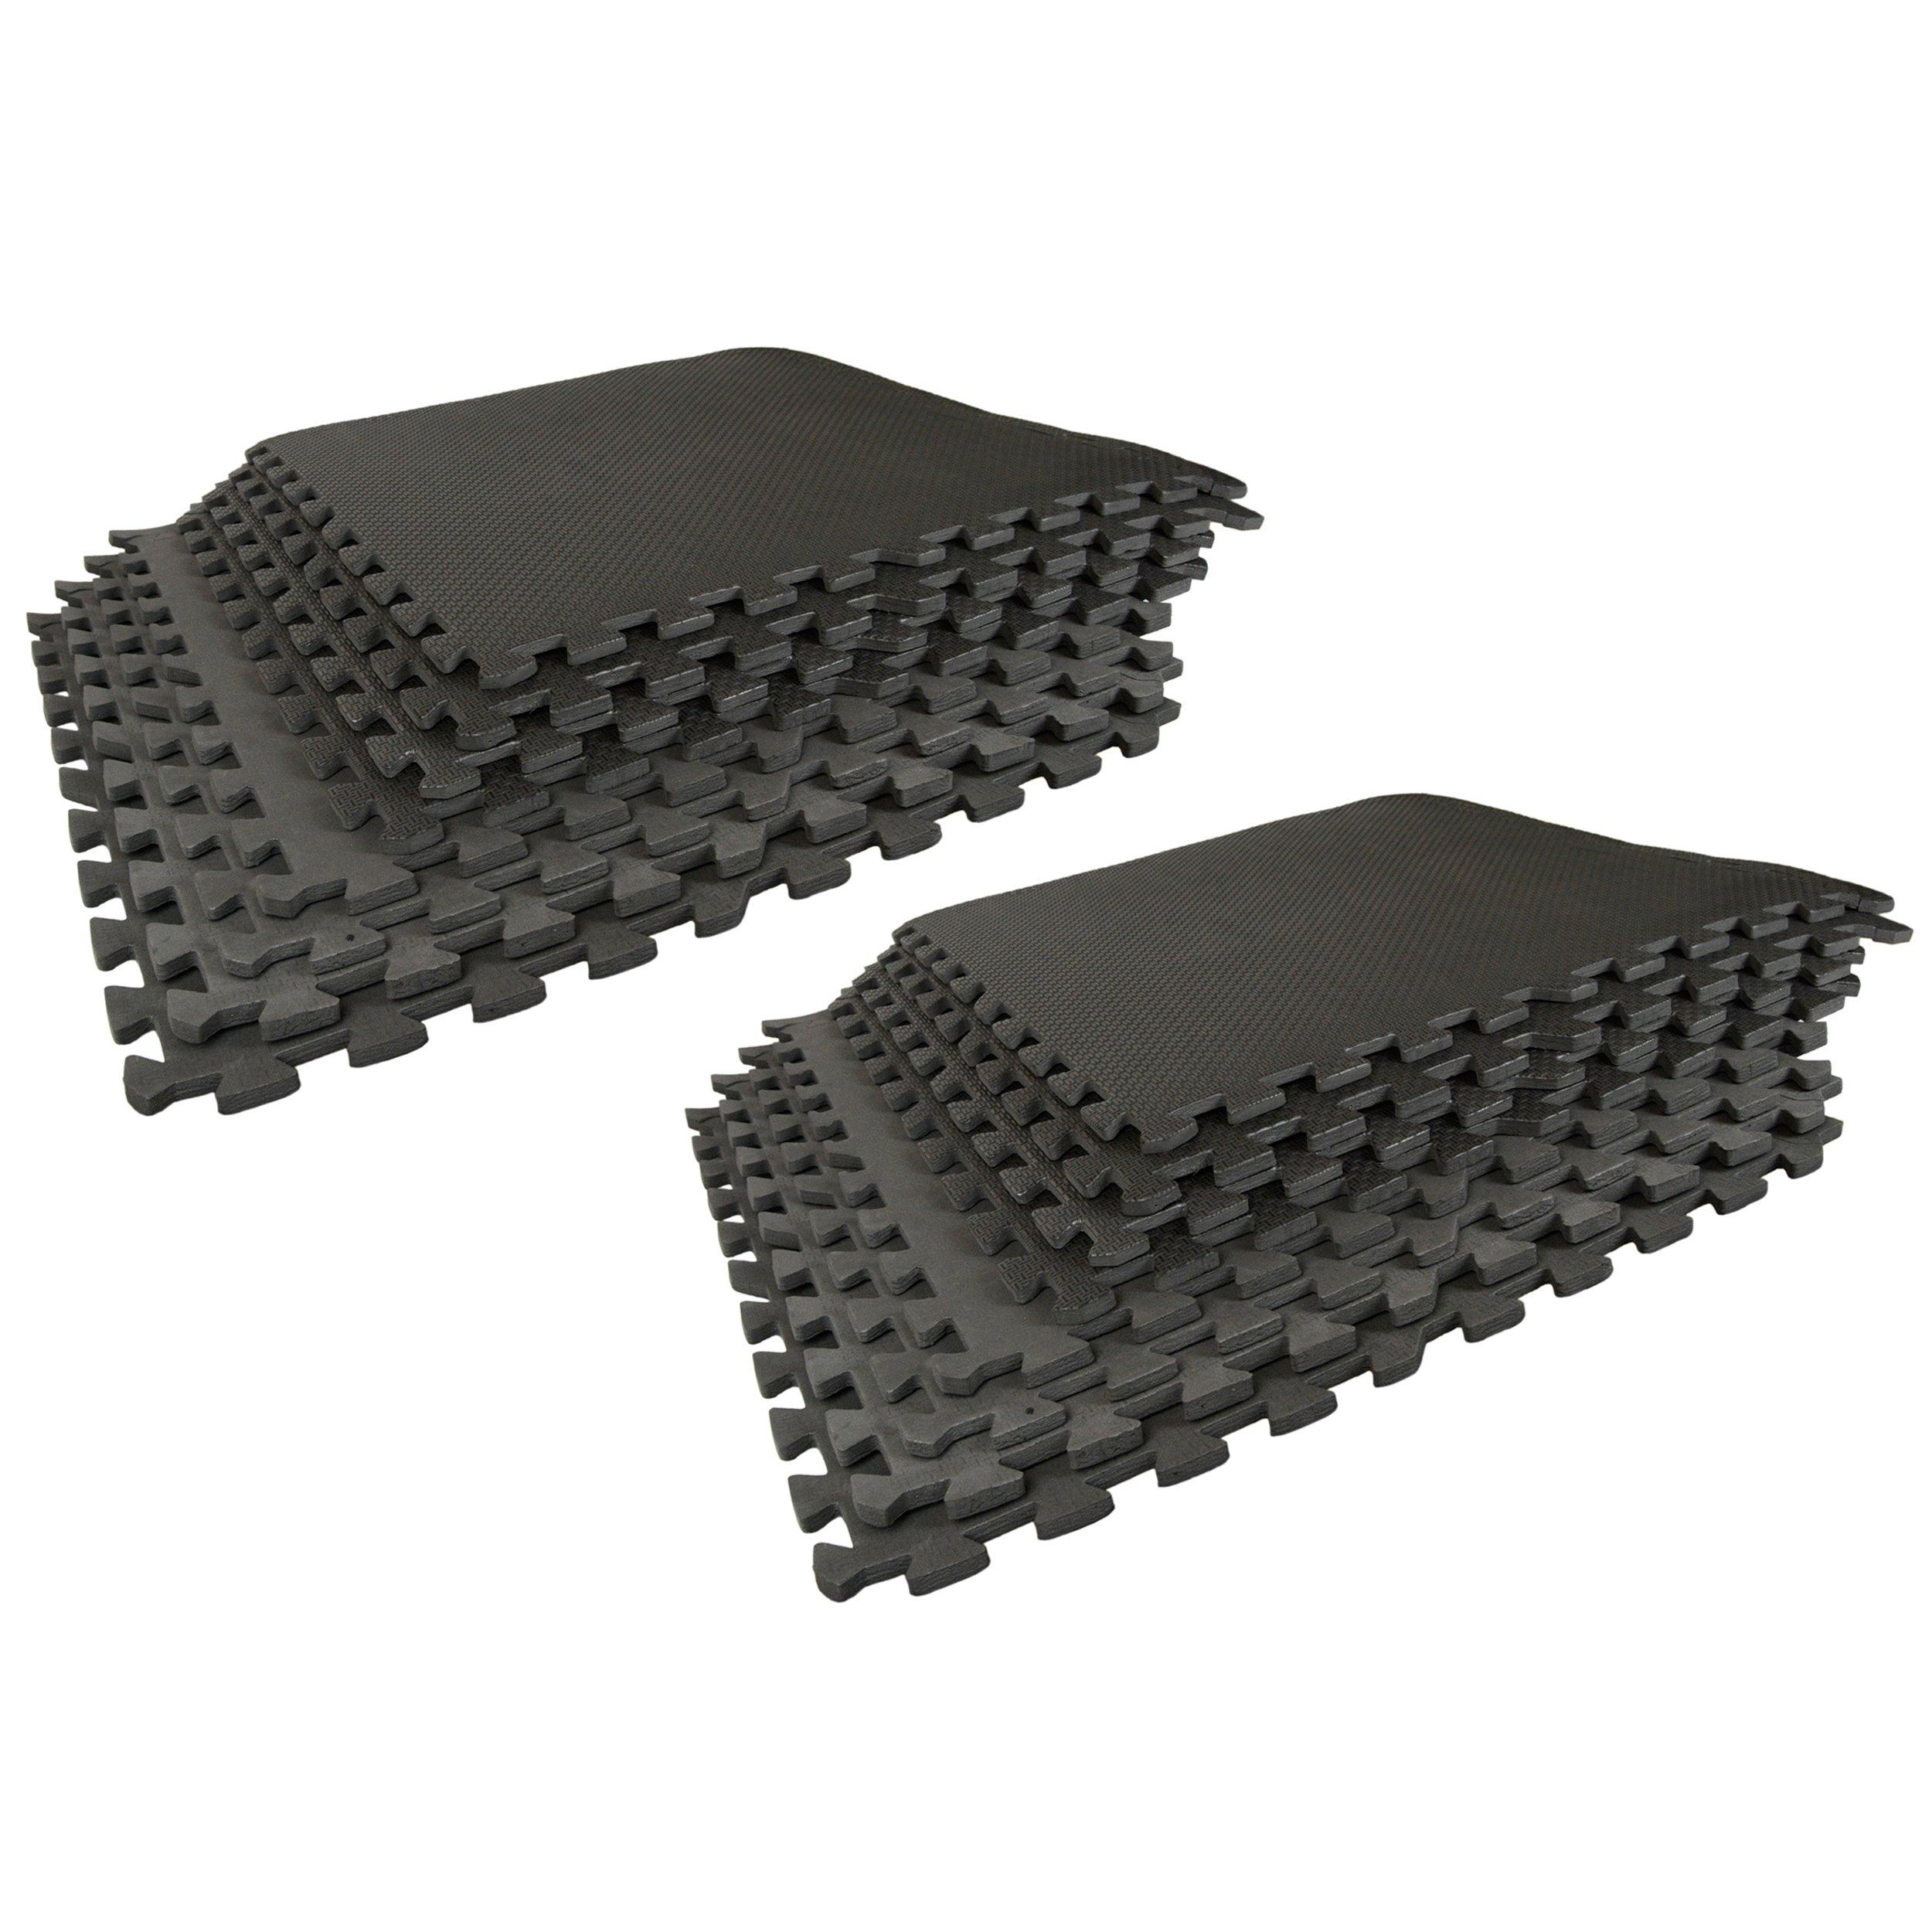 Best Step Interlocking Anti Fatigue Flooring Tiles For